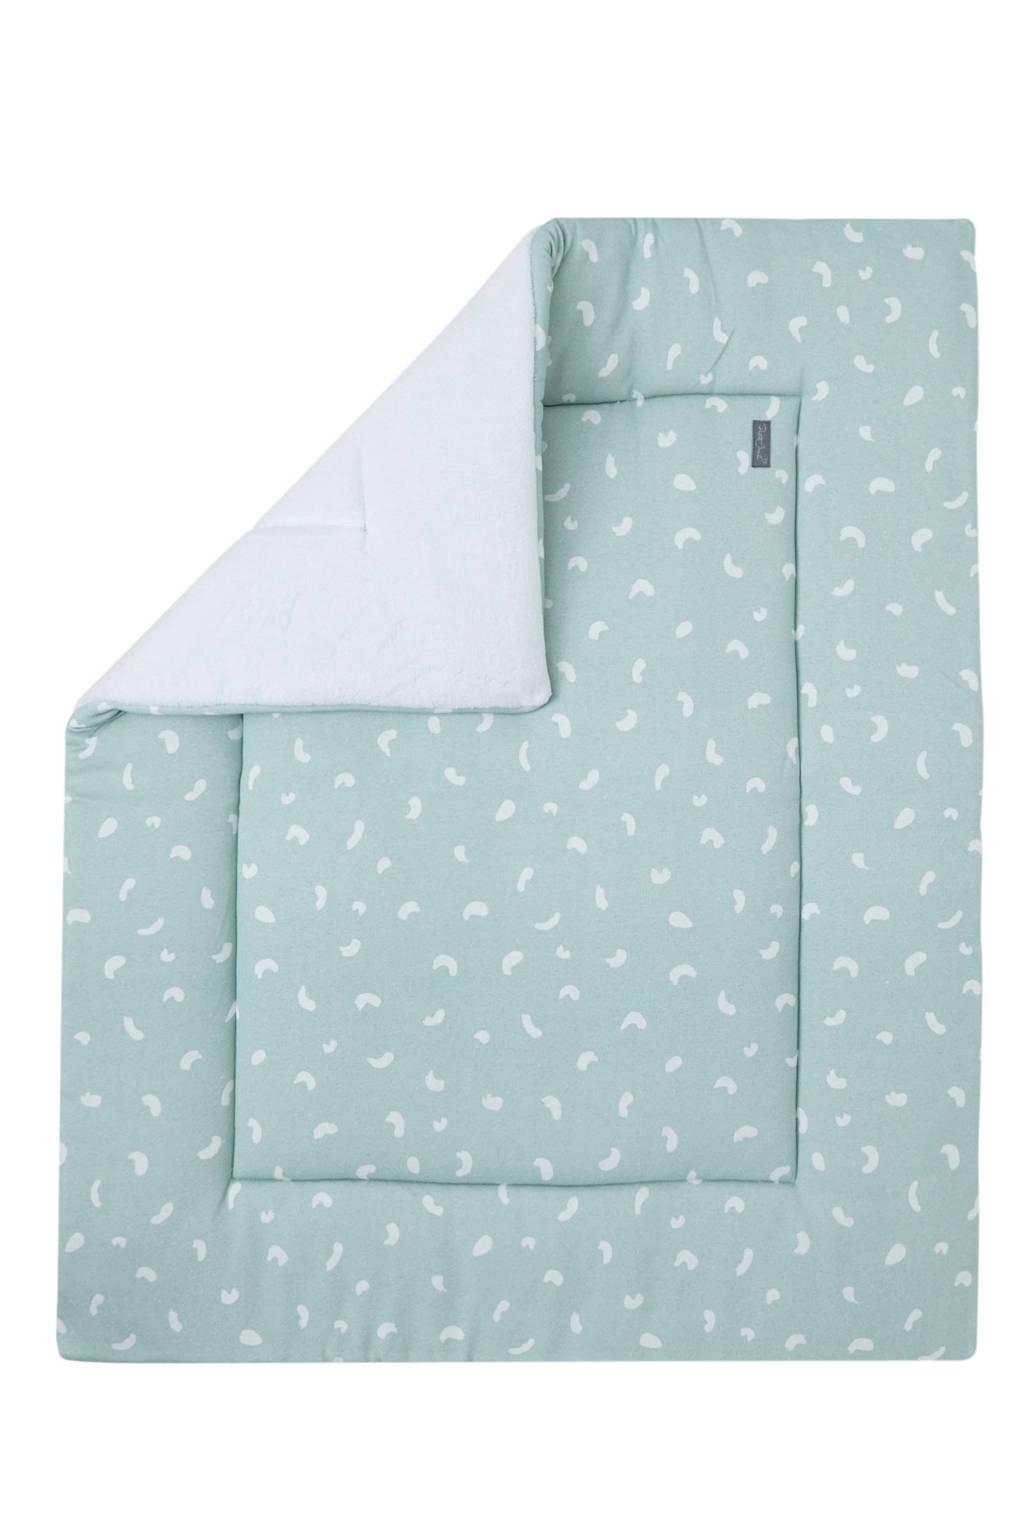 Petit Juul boxkleed groen/wit 75x95 cm, Groen/wit